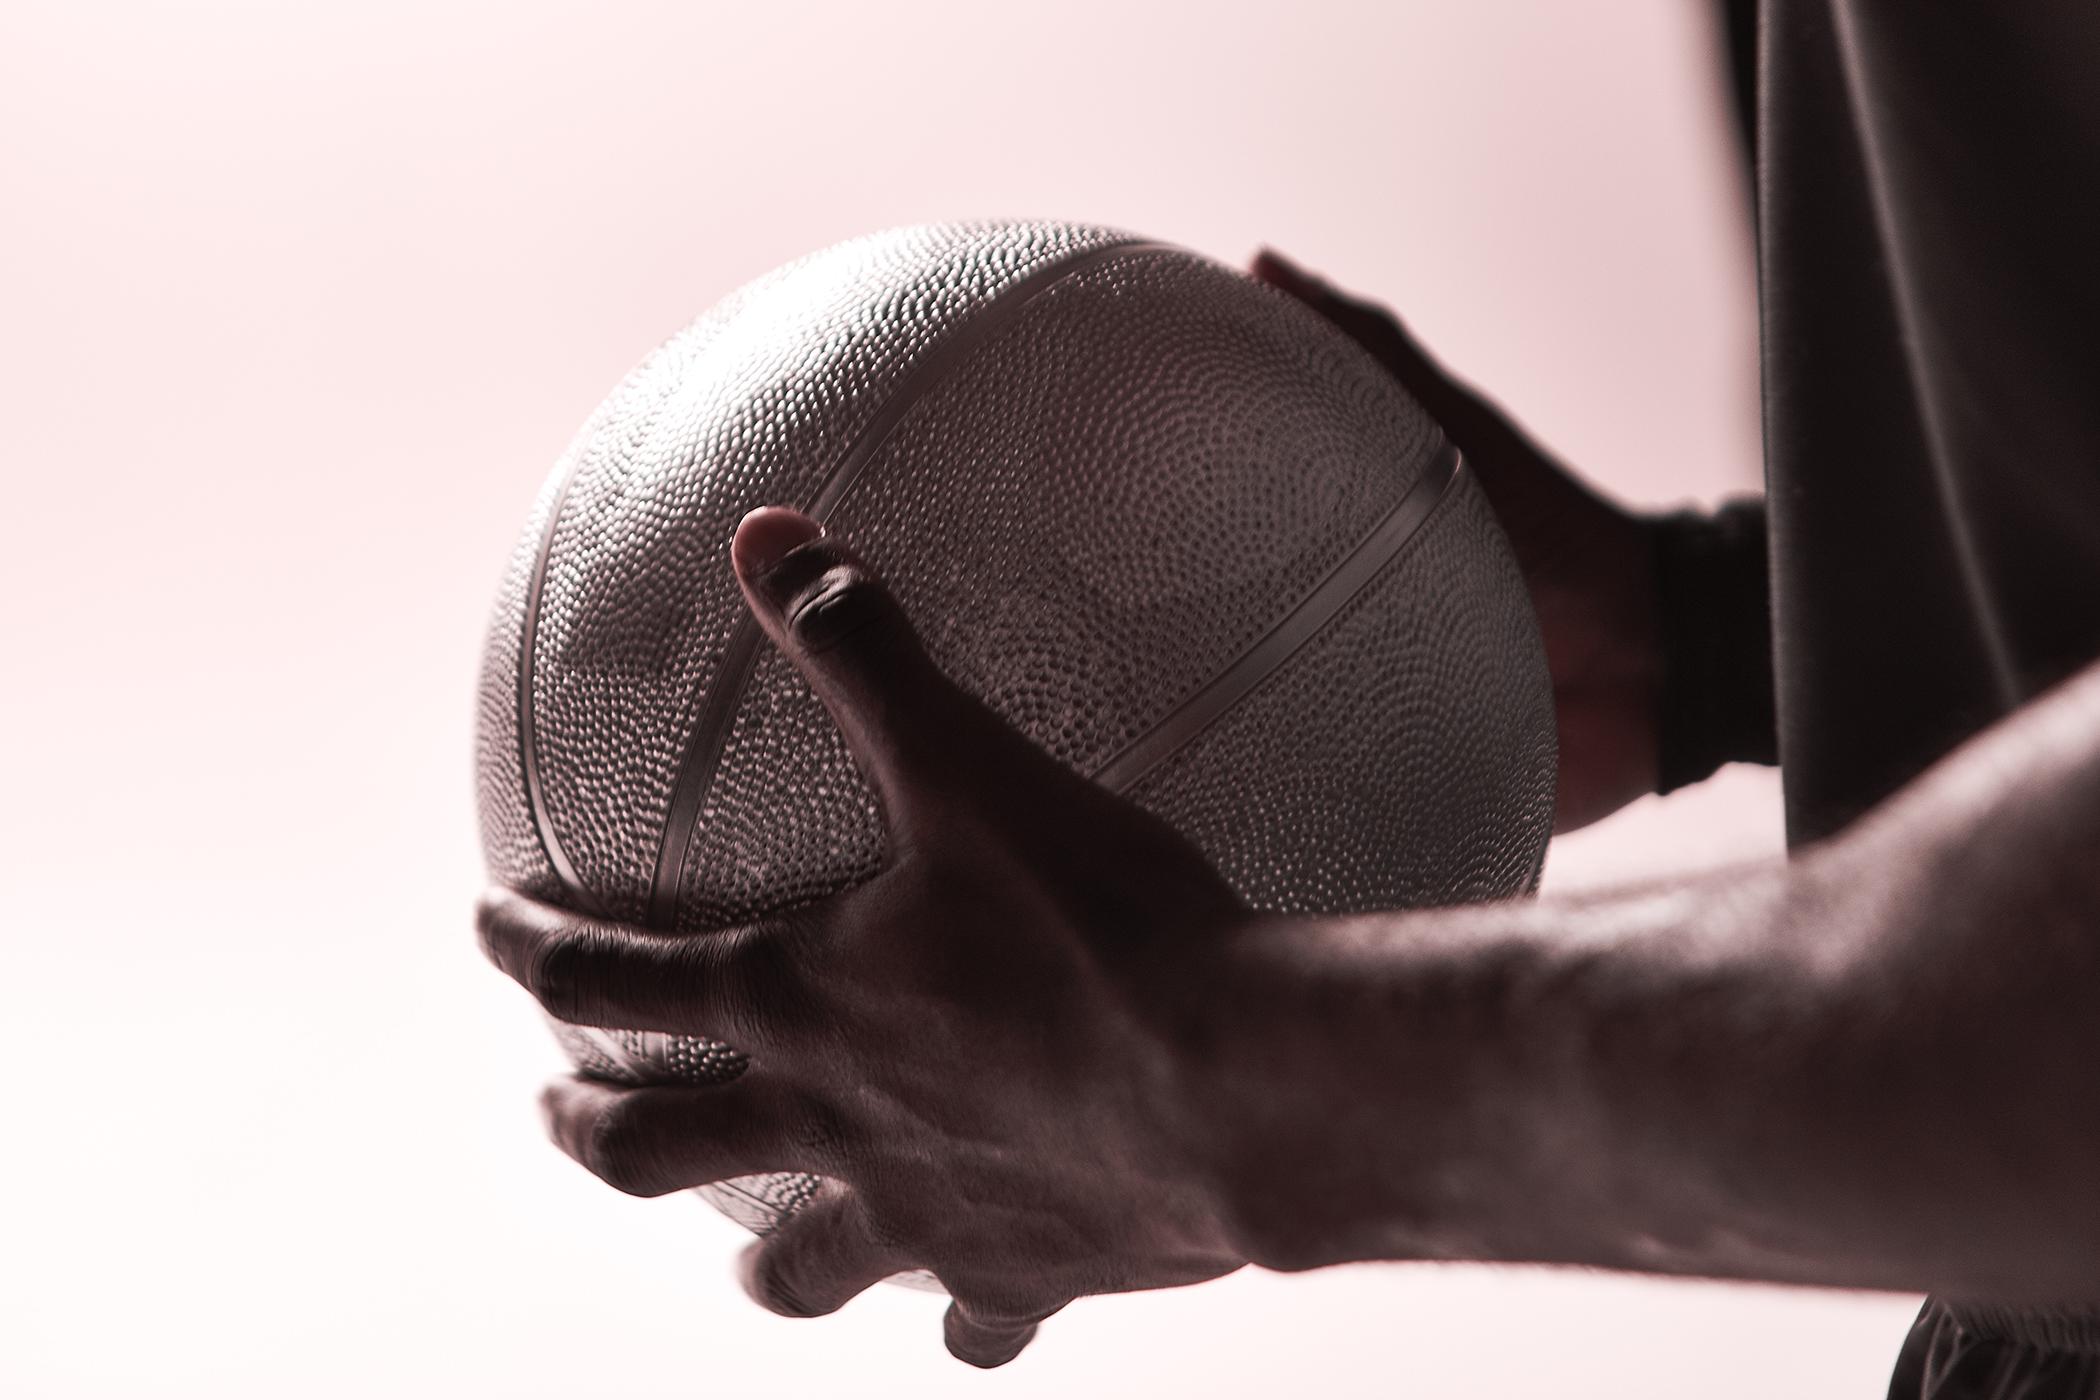 Basketball_134colour lookup 2 copy.jpg